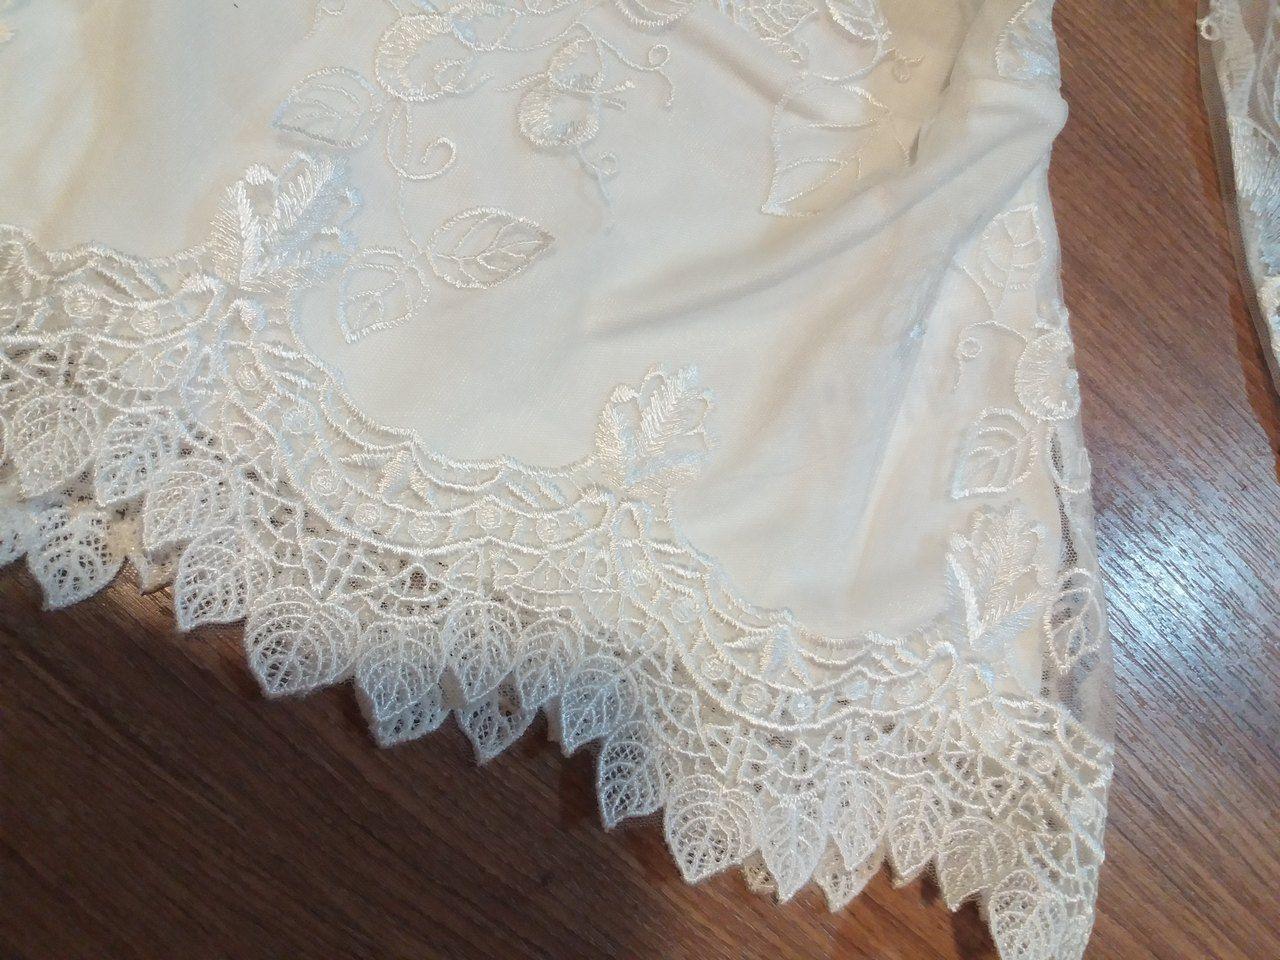 Blusa bordada manga longa